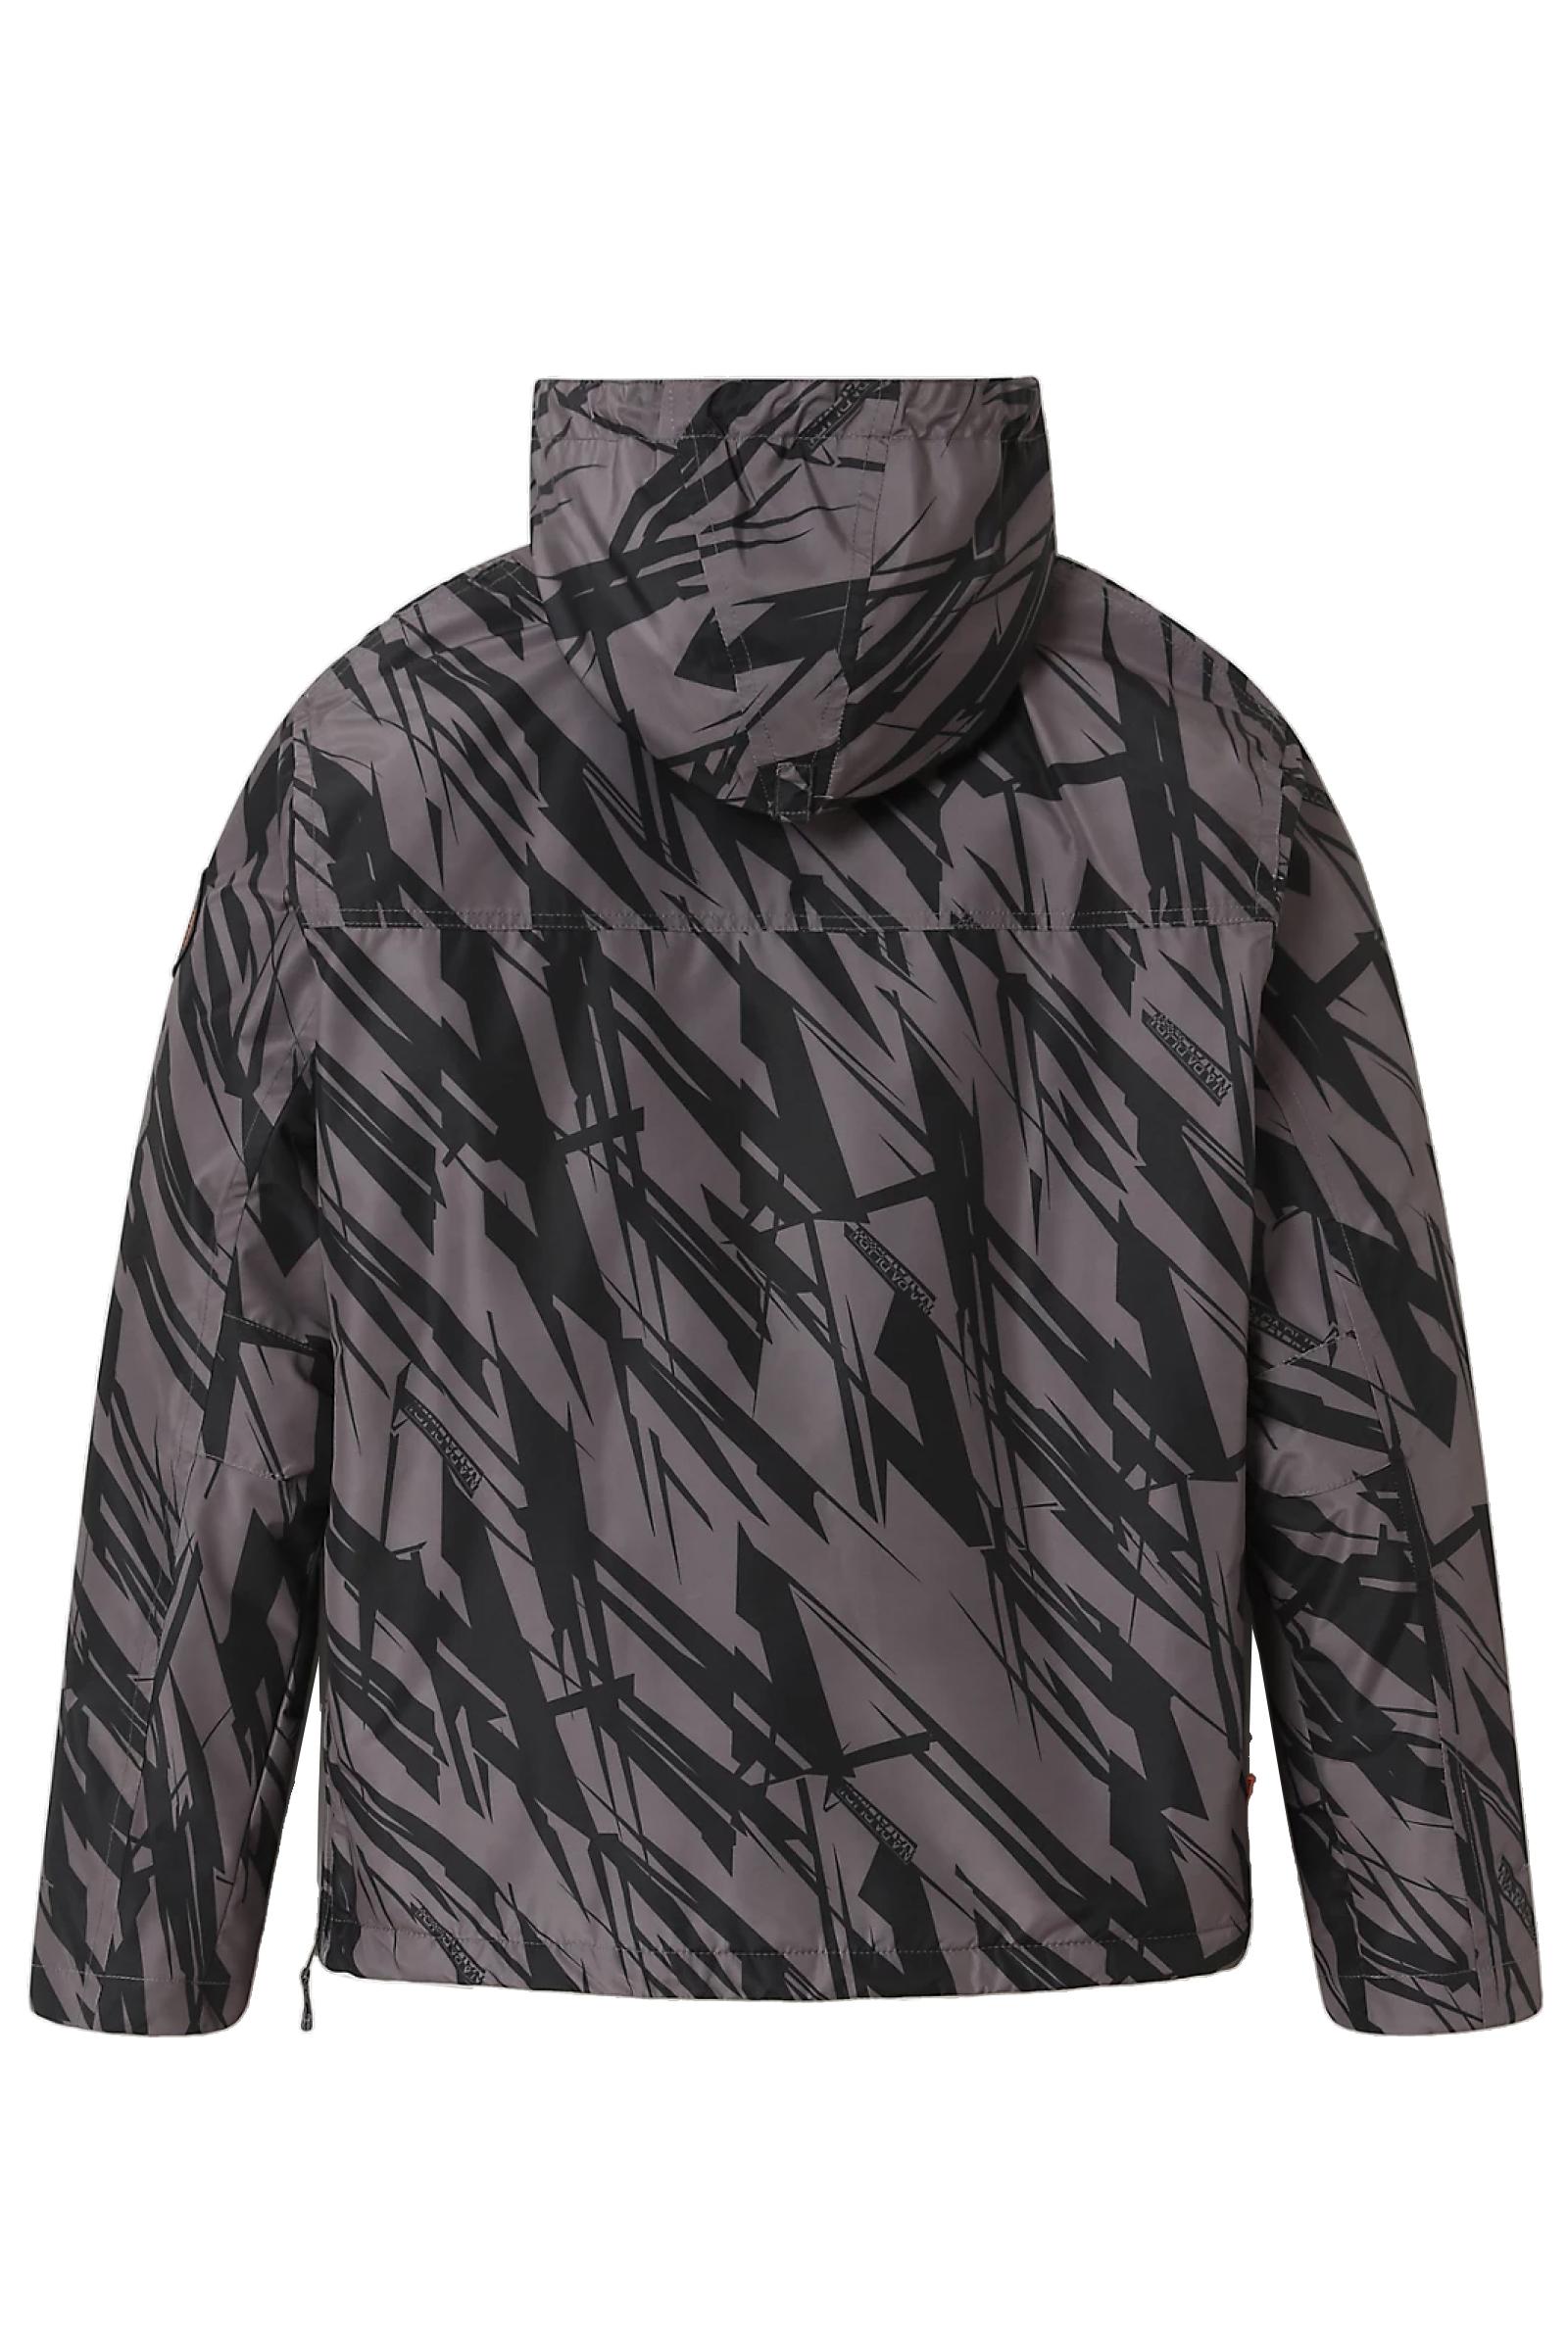 NAPAPIJRI Men's Rainforest Poket Print Jacket NAPAPIJRI | Jacket | NP0A4EGWF1J1